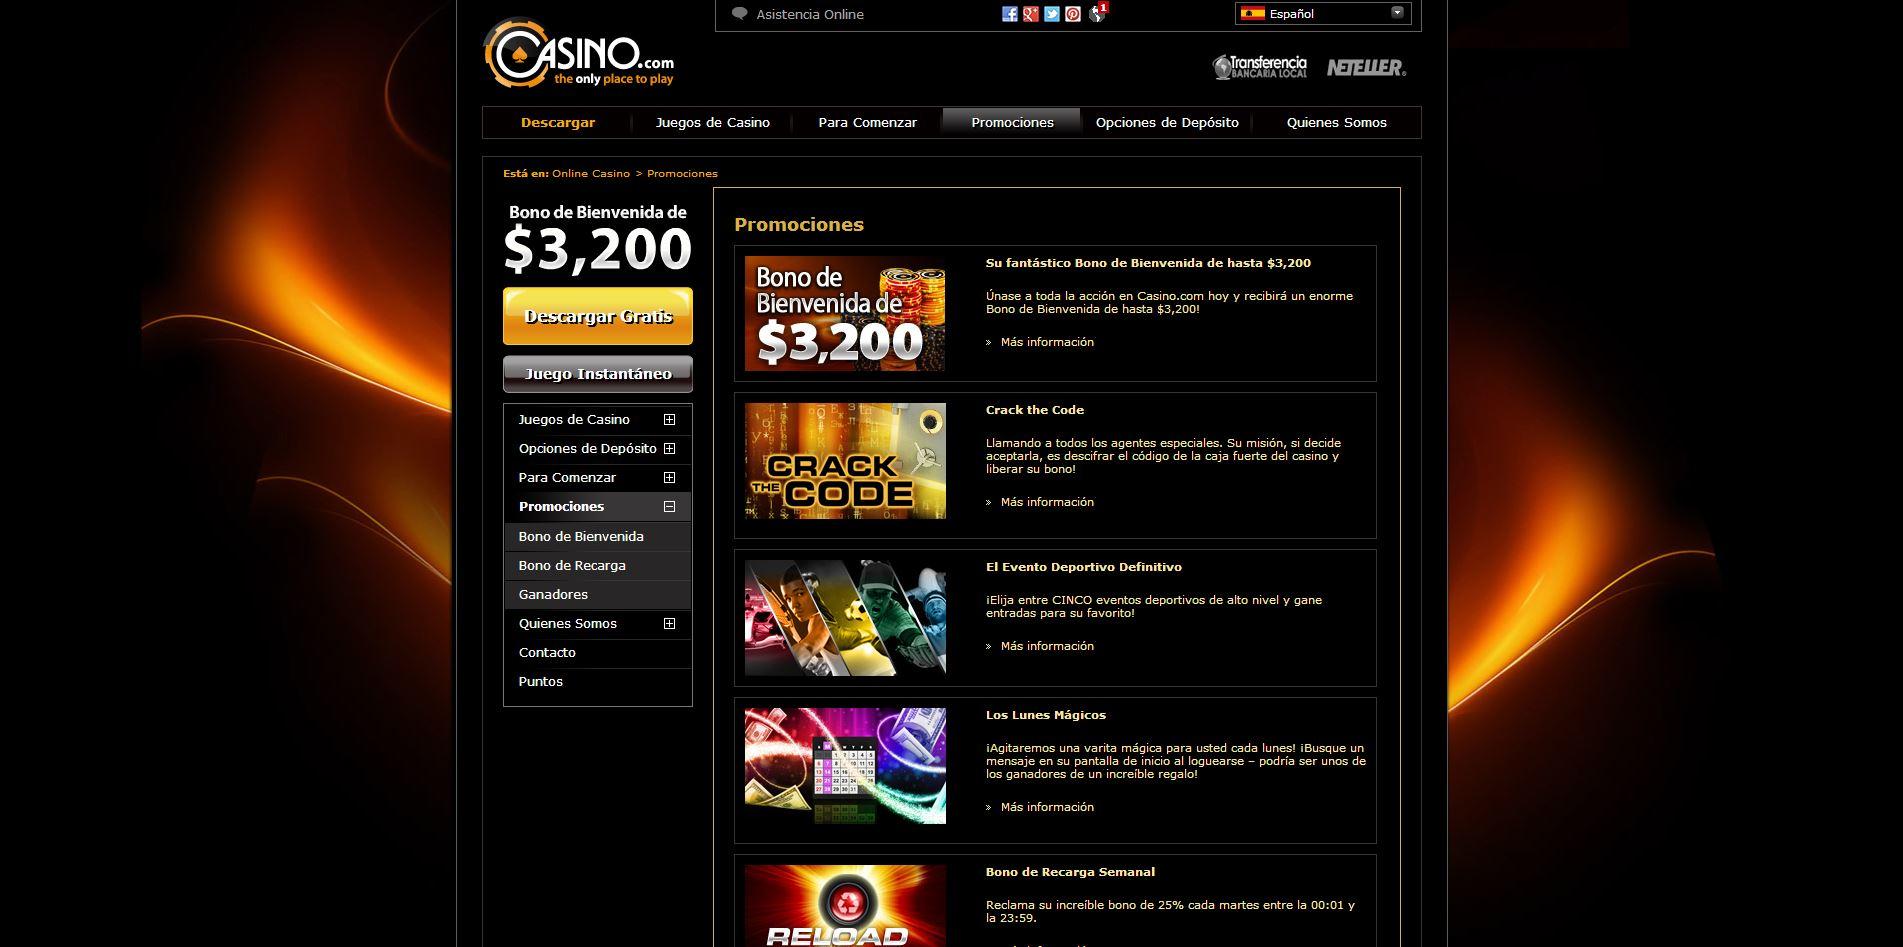 Casino online software - 13838